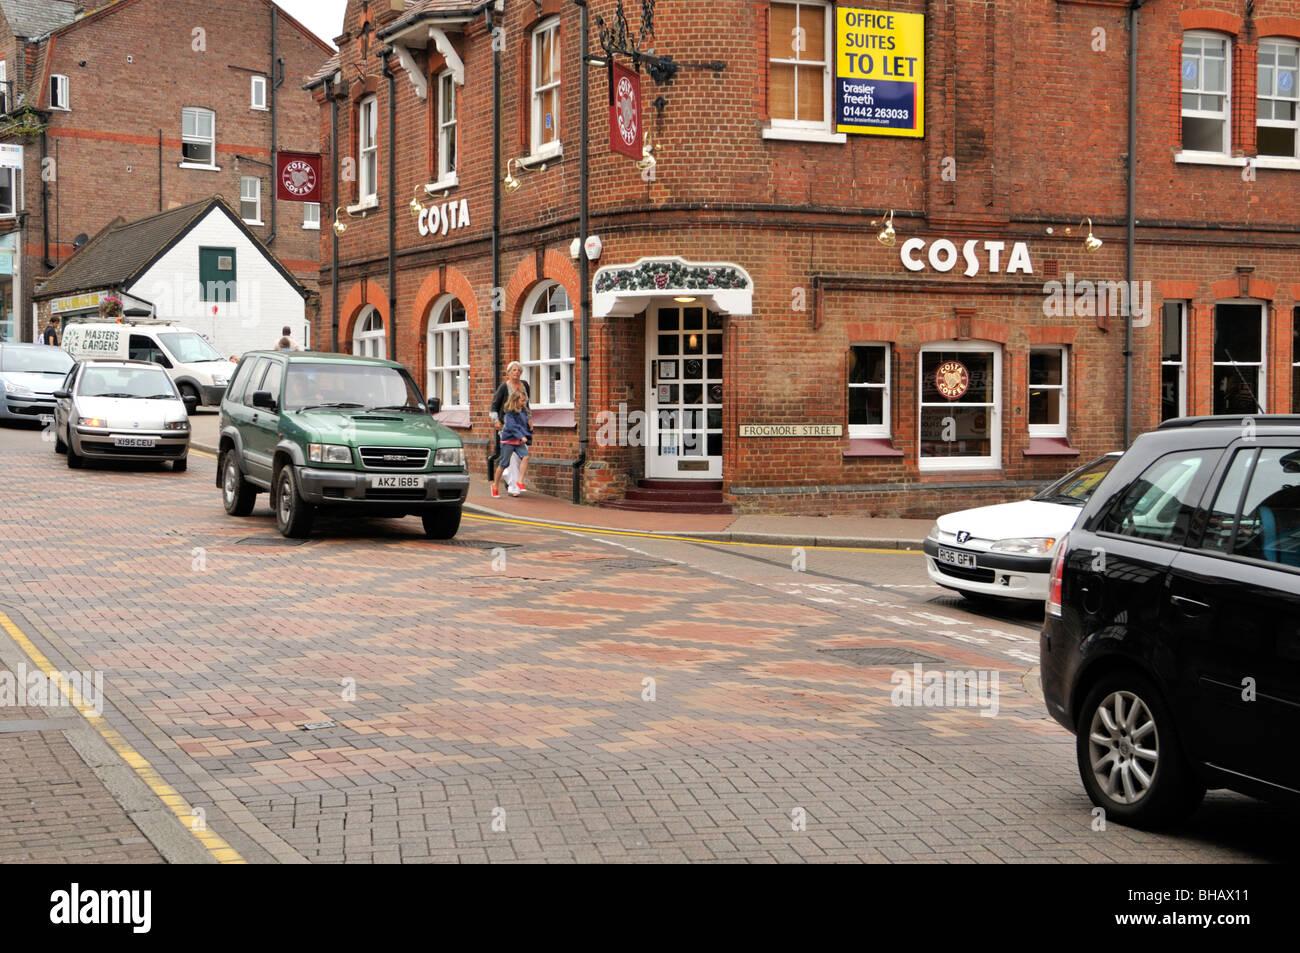 Ornately patterned road surfaces of Tring High Street, Hertfordshire, UK. - Stock Image